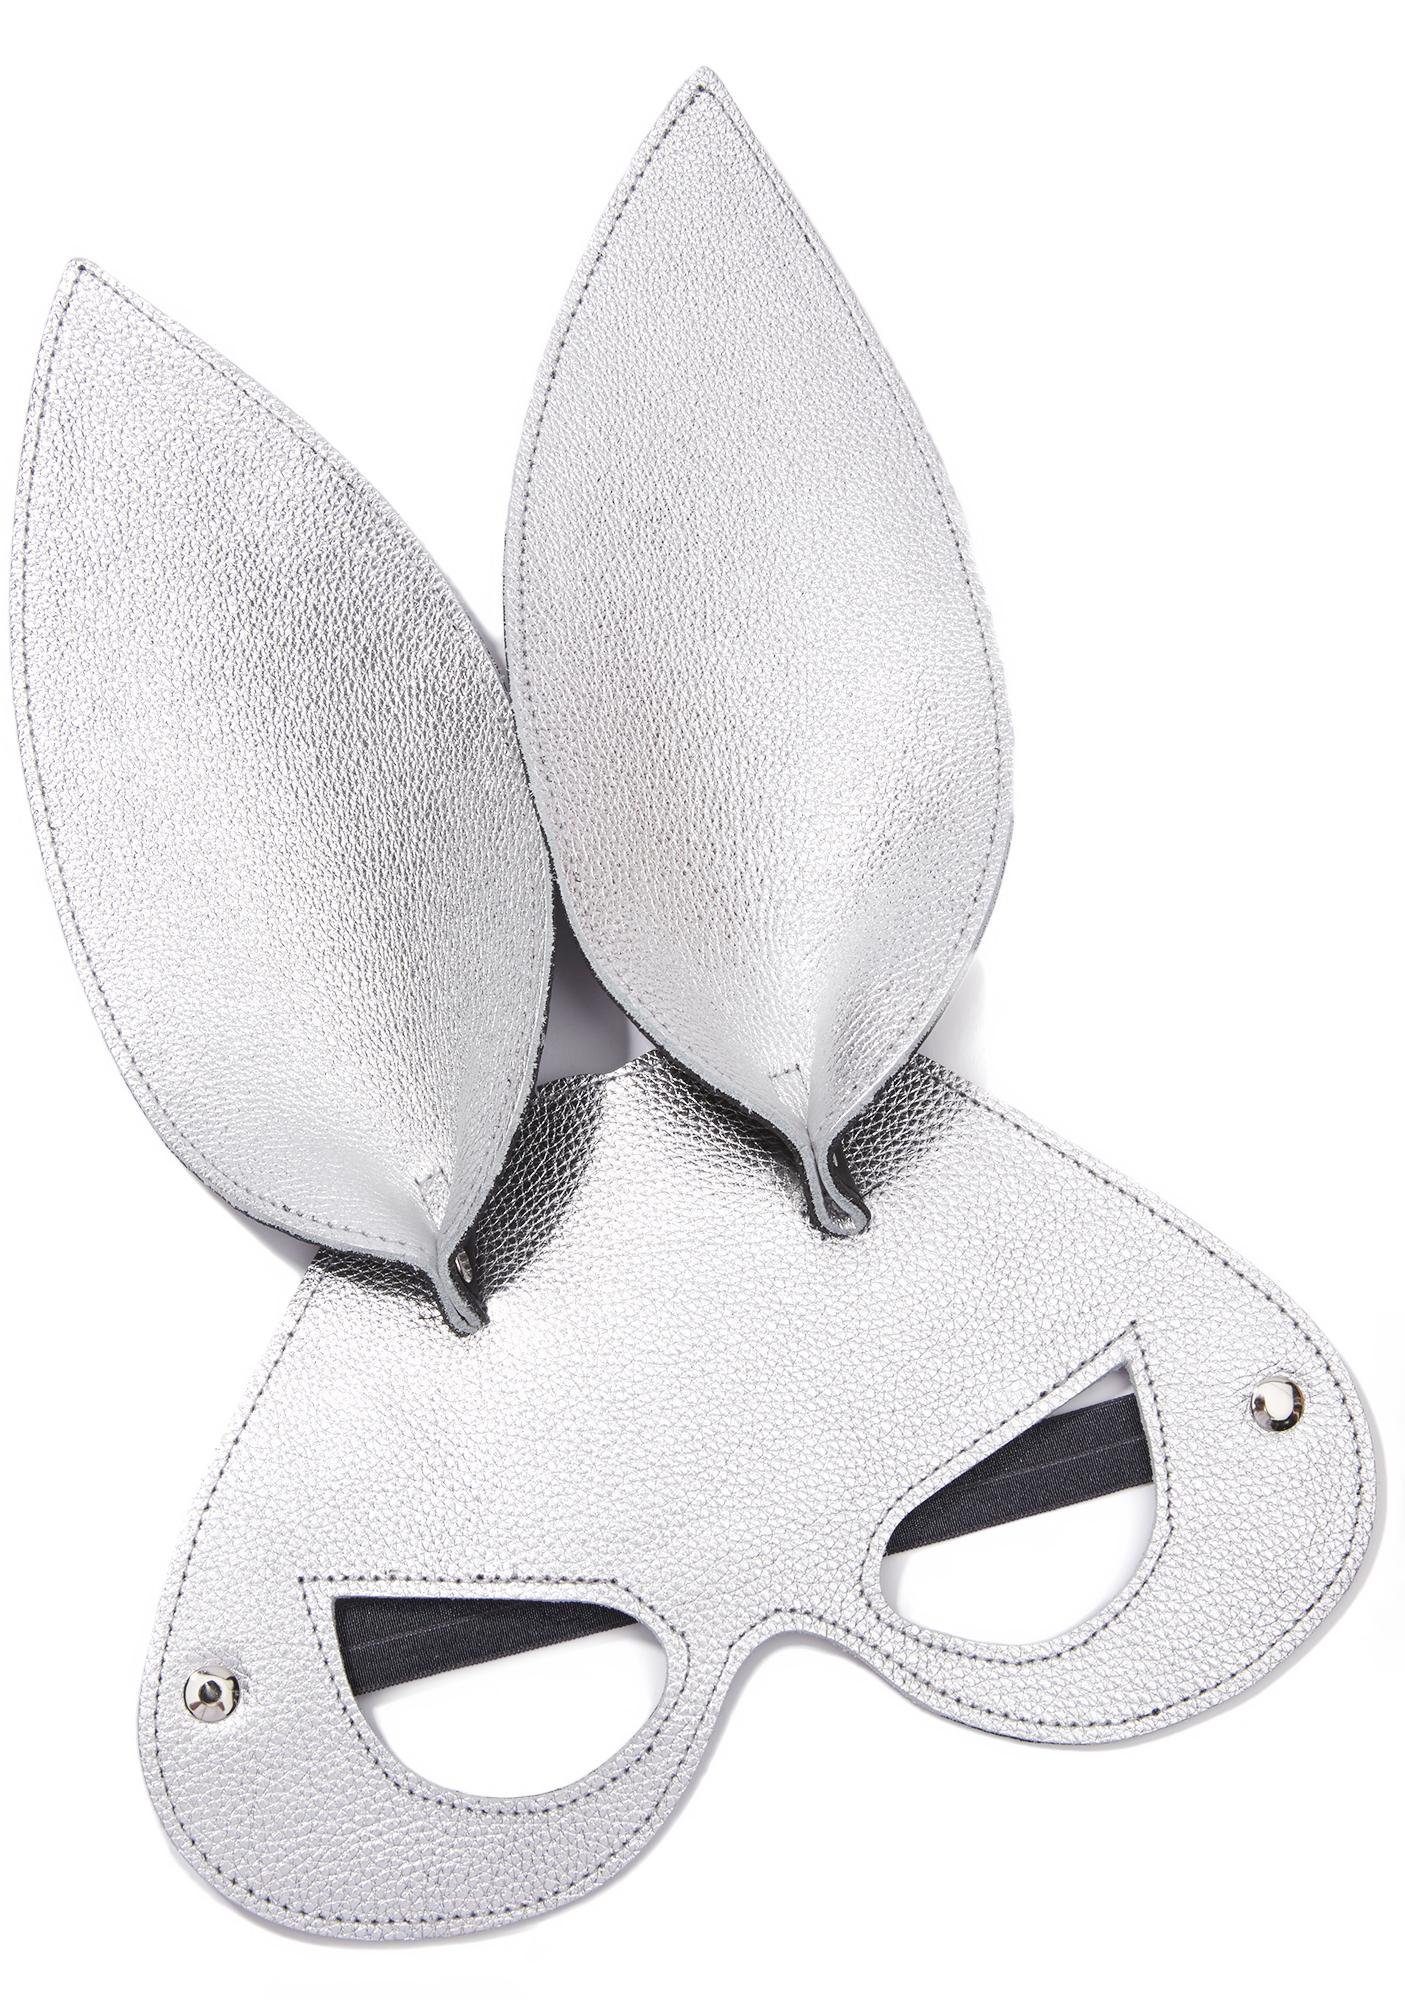 Masquer-Babe Bunny Mask